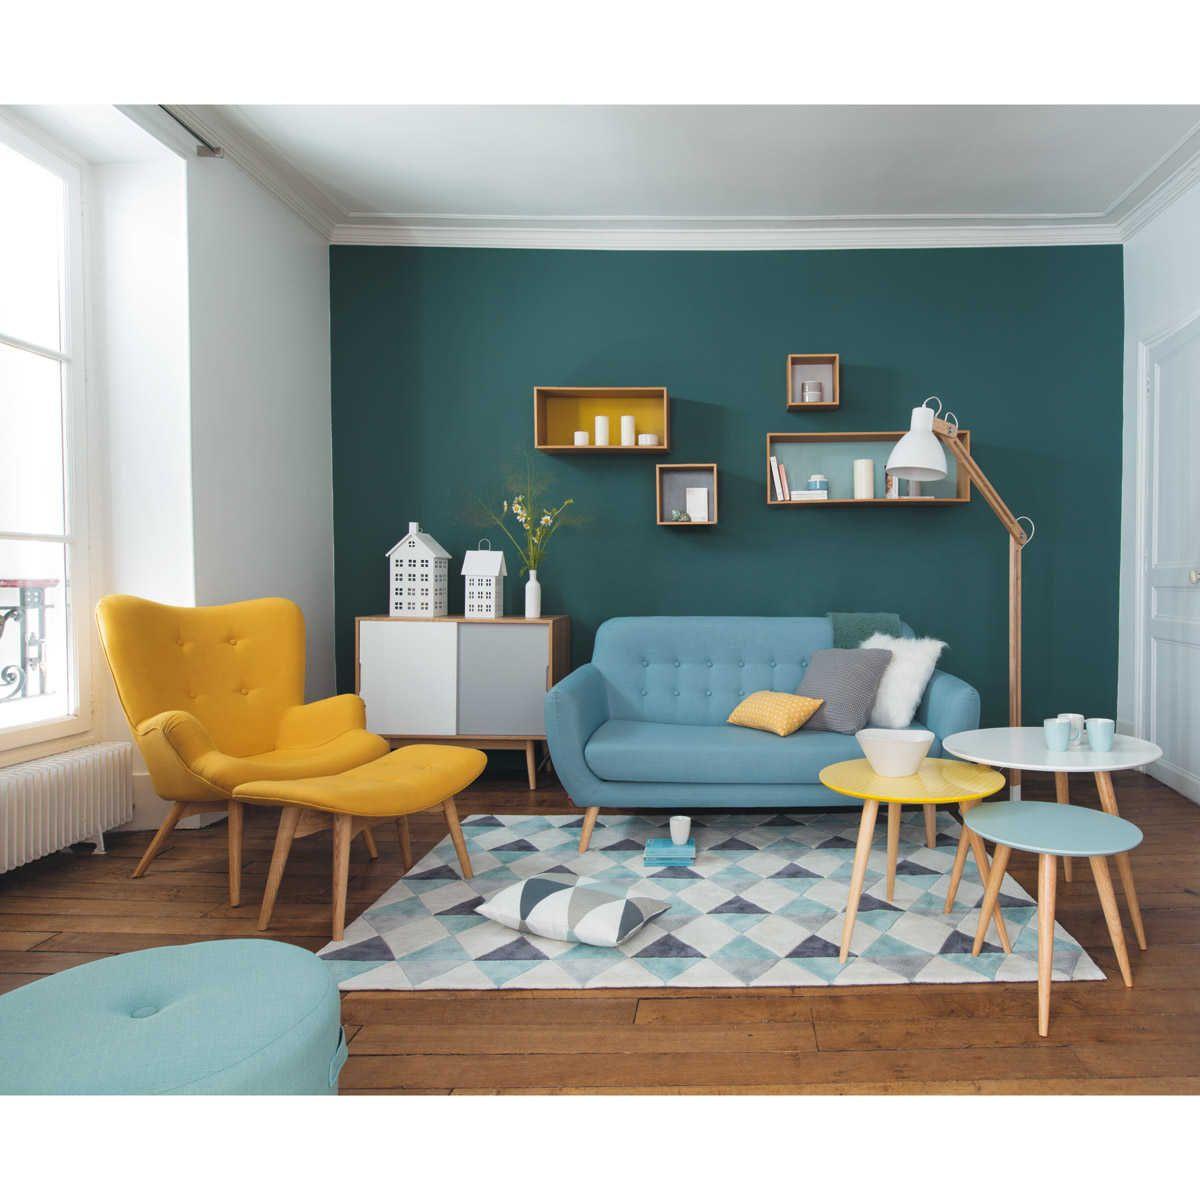 Canape places retro bleu iceberg livingroom inspiration pinterest blue yellow and living rooms also rh